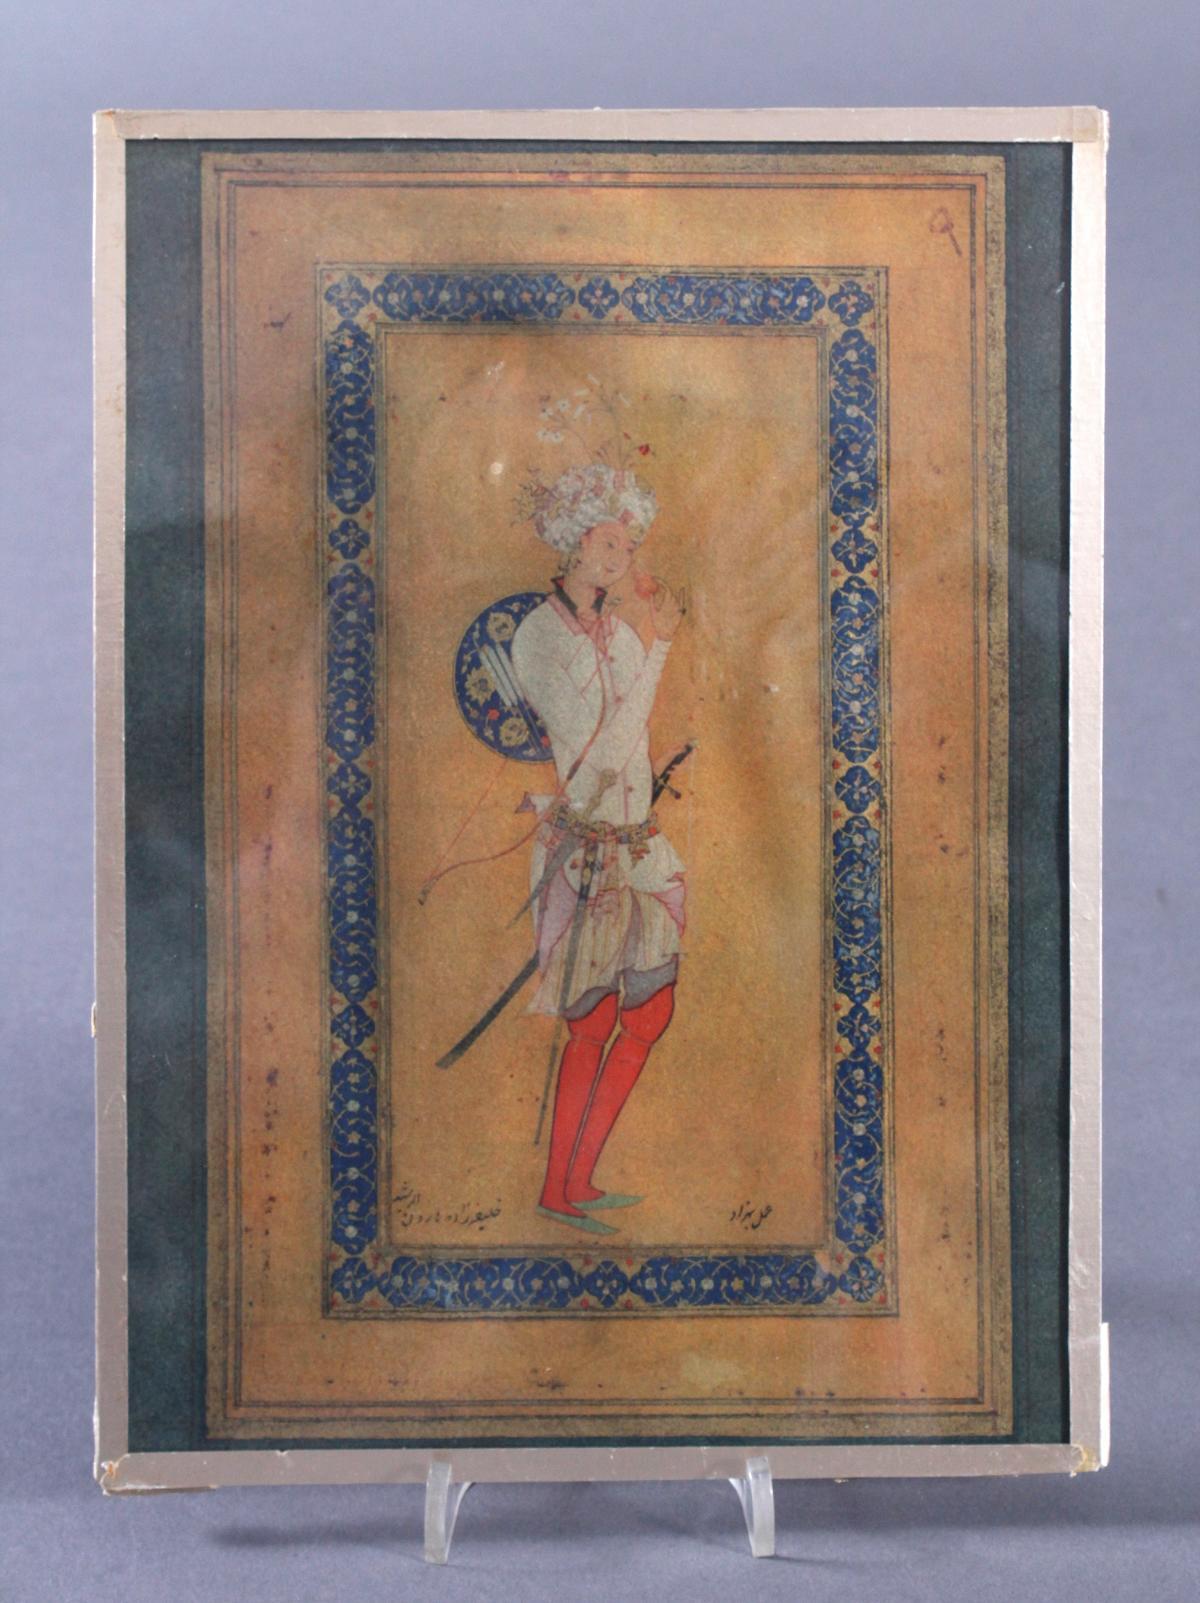 Persische Malerei, 17. Jahrhundert